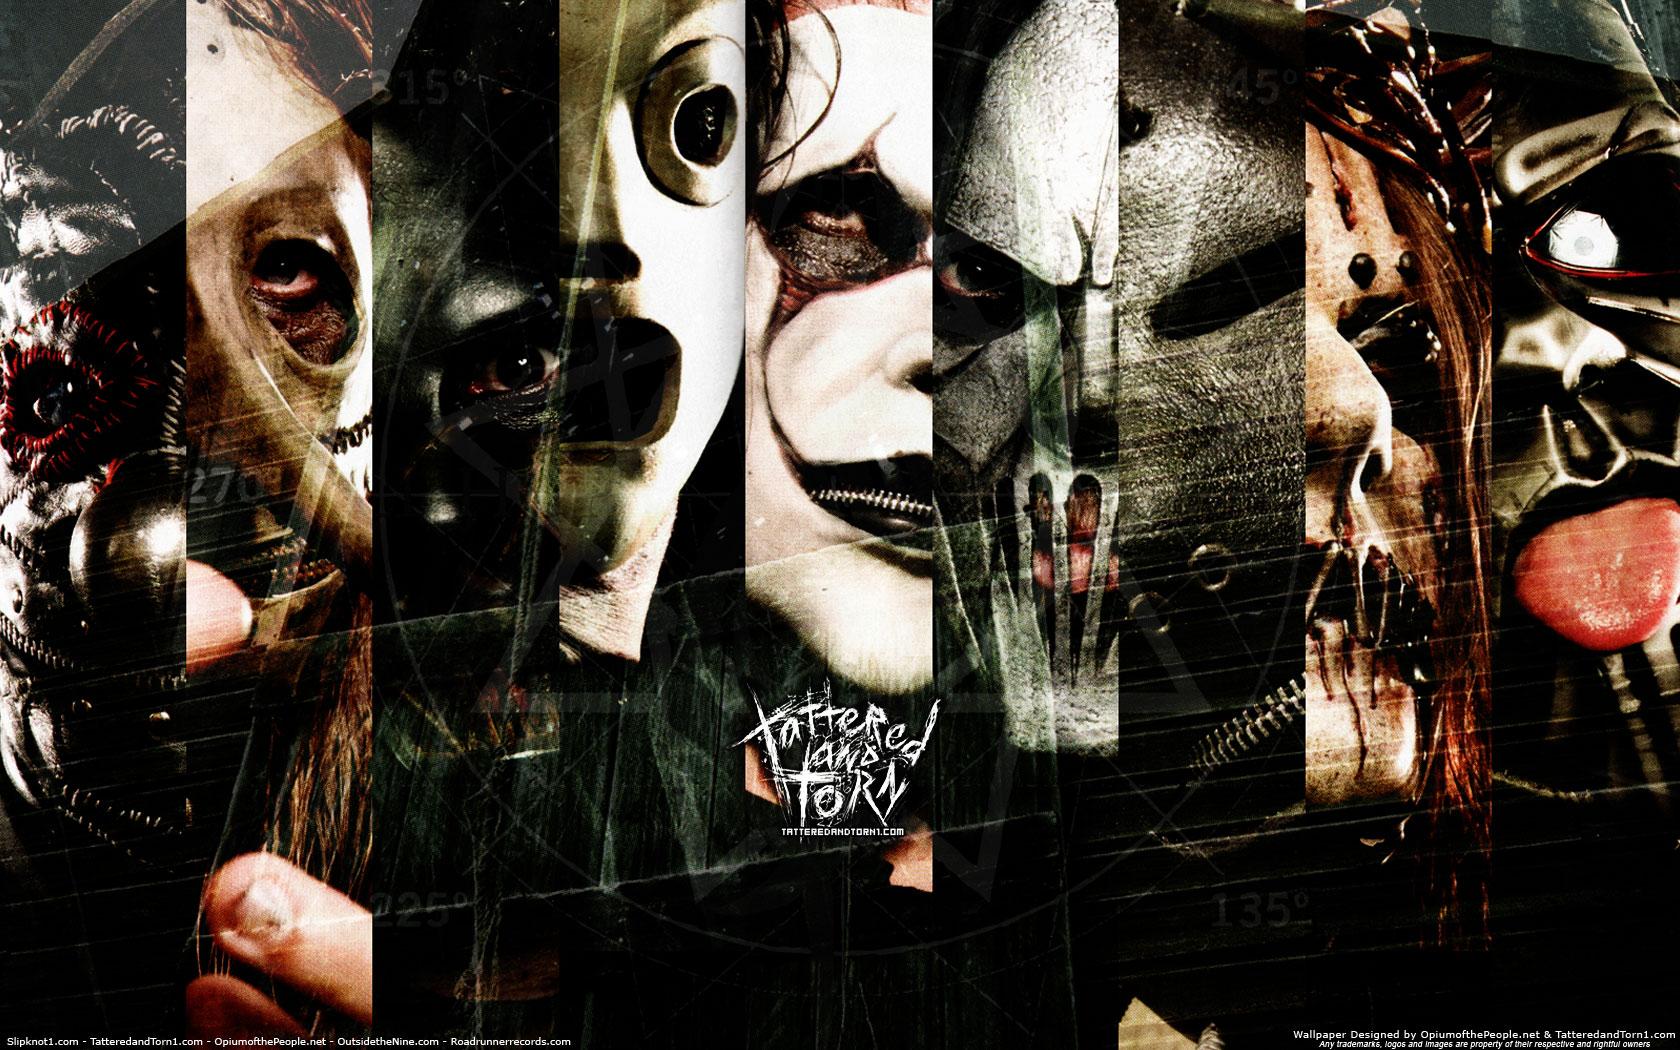 Slipknot Wallpaper Wallpapers HD Quality 1680x1050